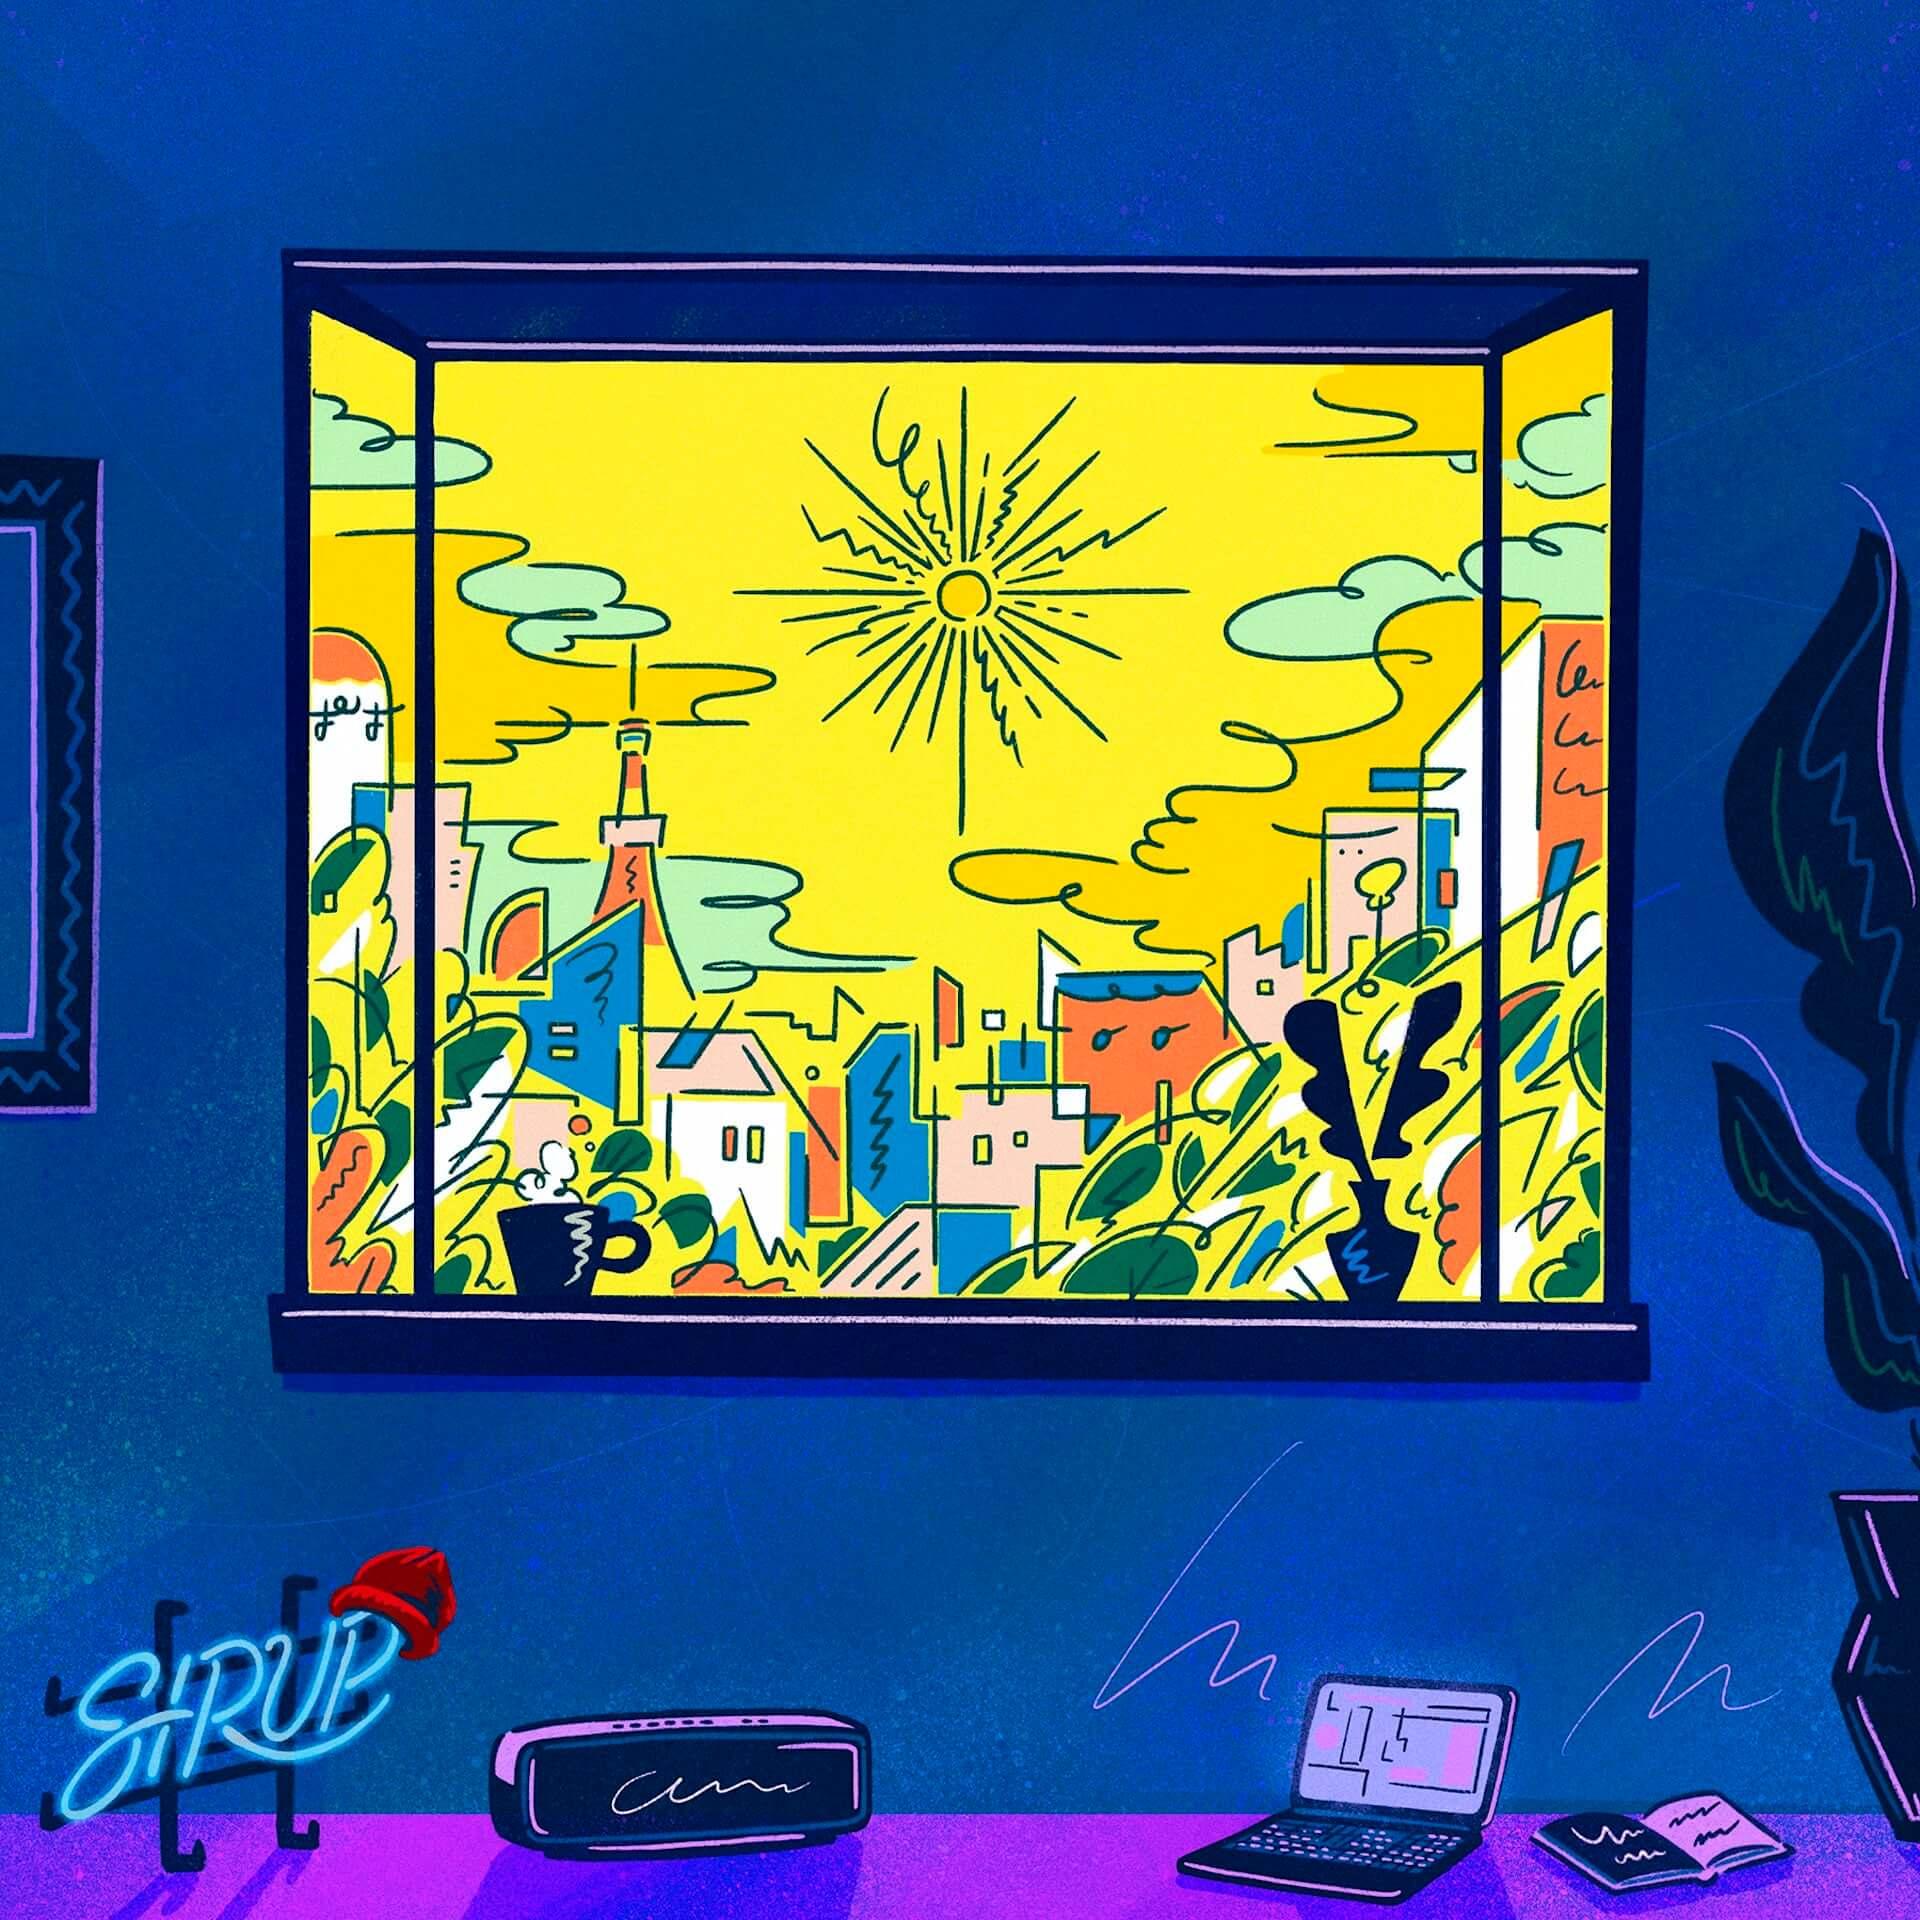 "SIRUPがUKのプロデューサー・ROMderfulとコラボした新曲""Online""をリリース決定|ジャケットデザインはOTANIJUN. music200715_sirup_1-1920x1920"